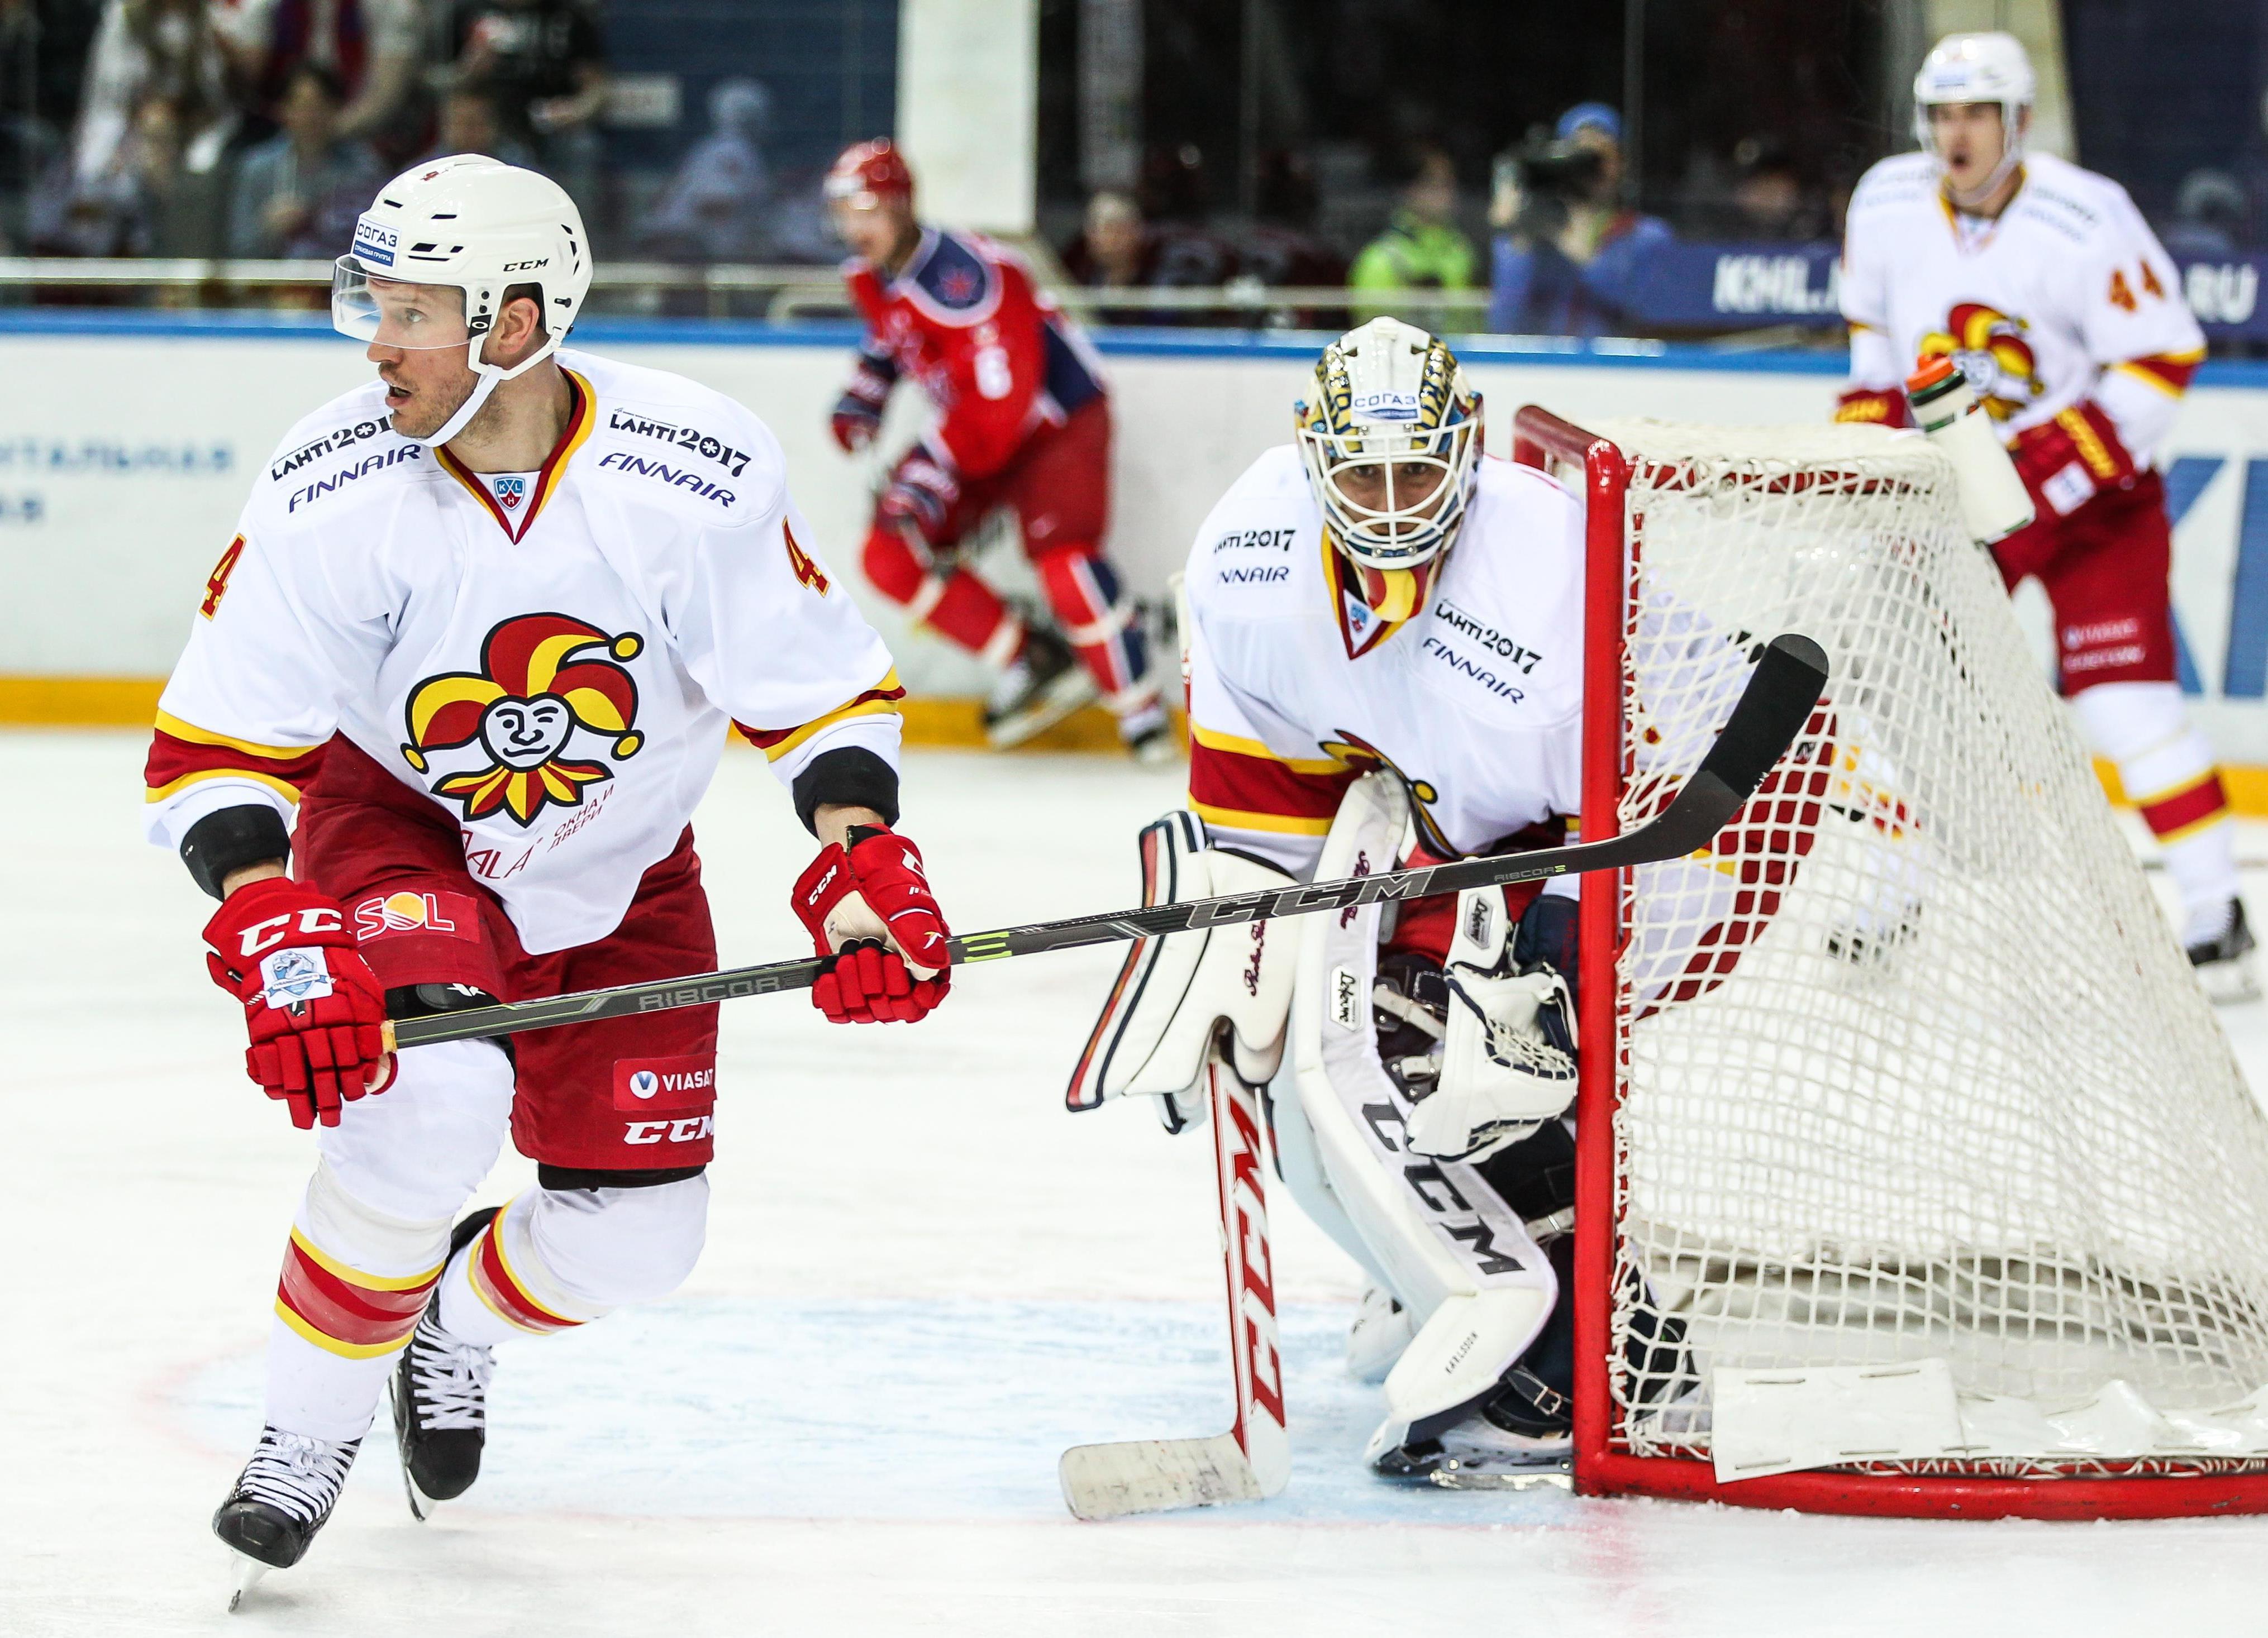 Jokerit Helsinik als KHL-Top-Team am Spengler-Cup